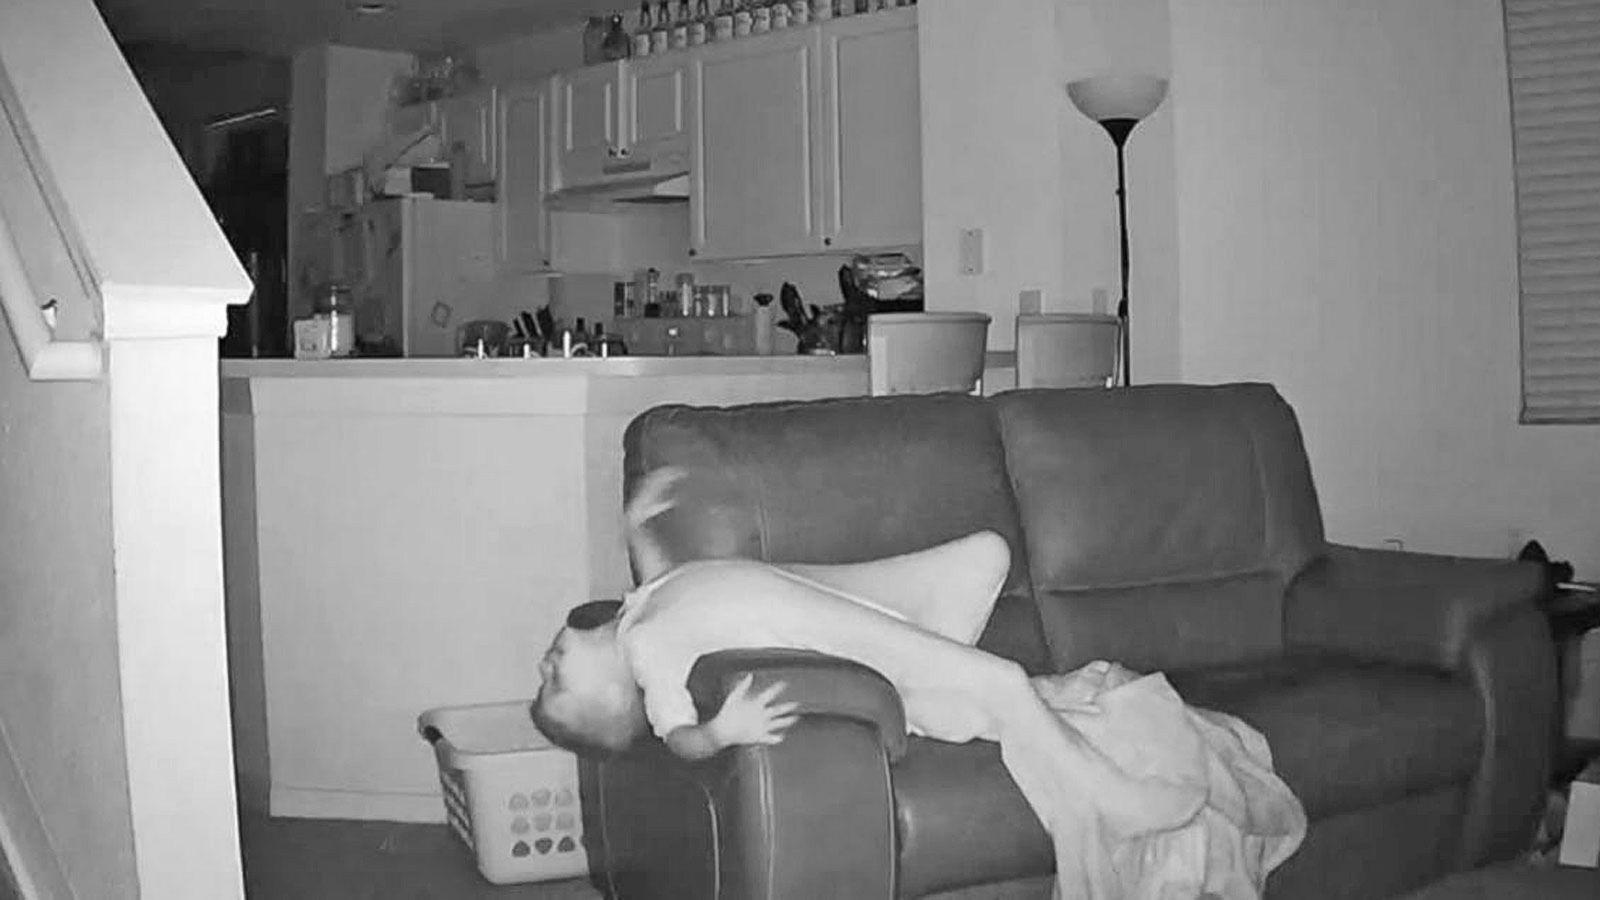 VIDEO: Video Captures Kid's Midnight Fun